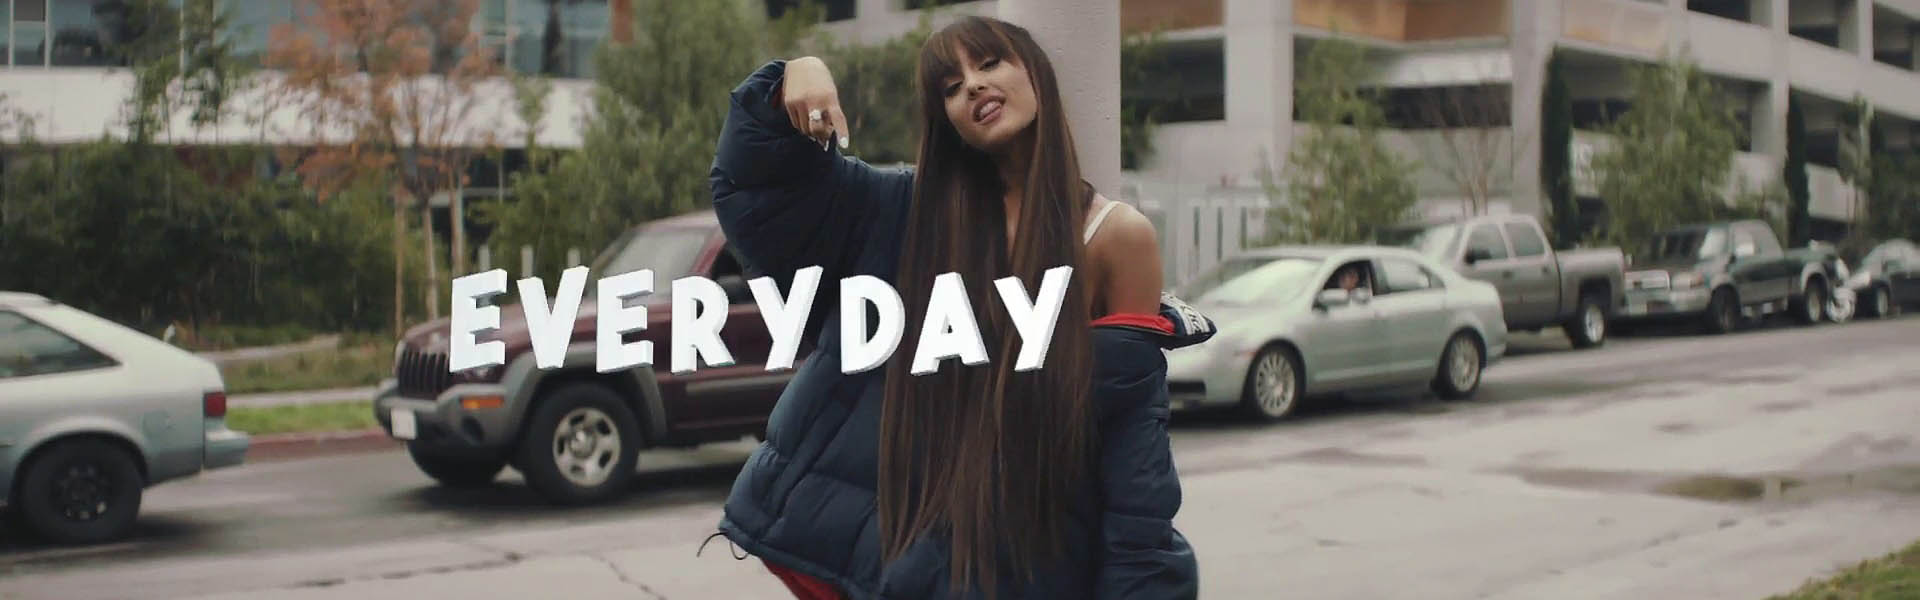 Ariana Grande Everyday Future